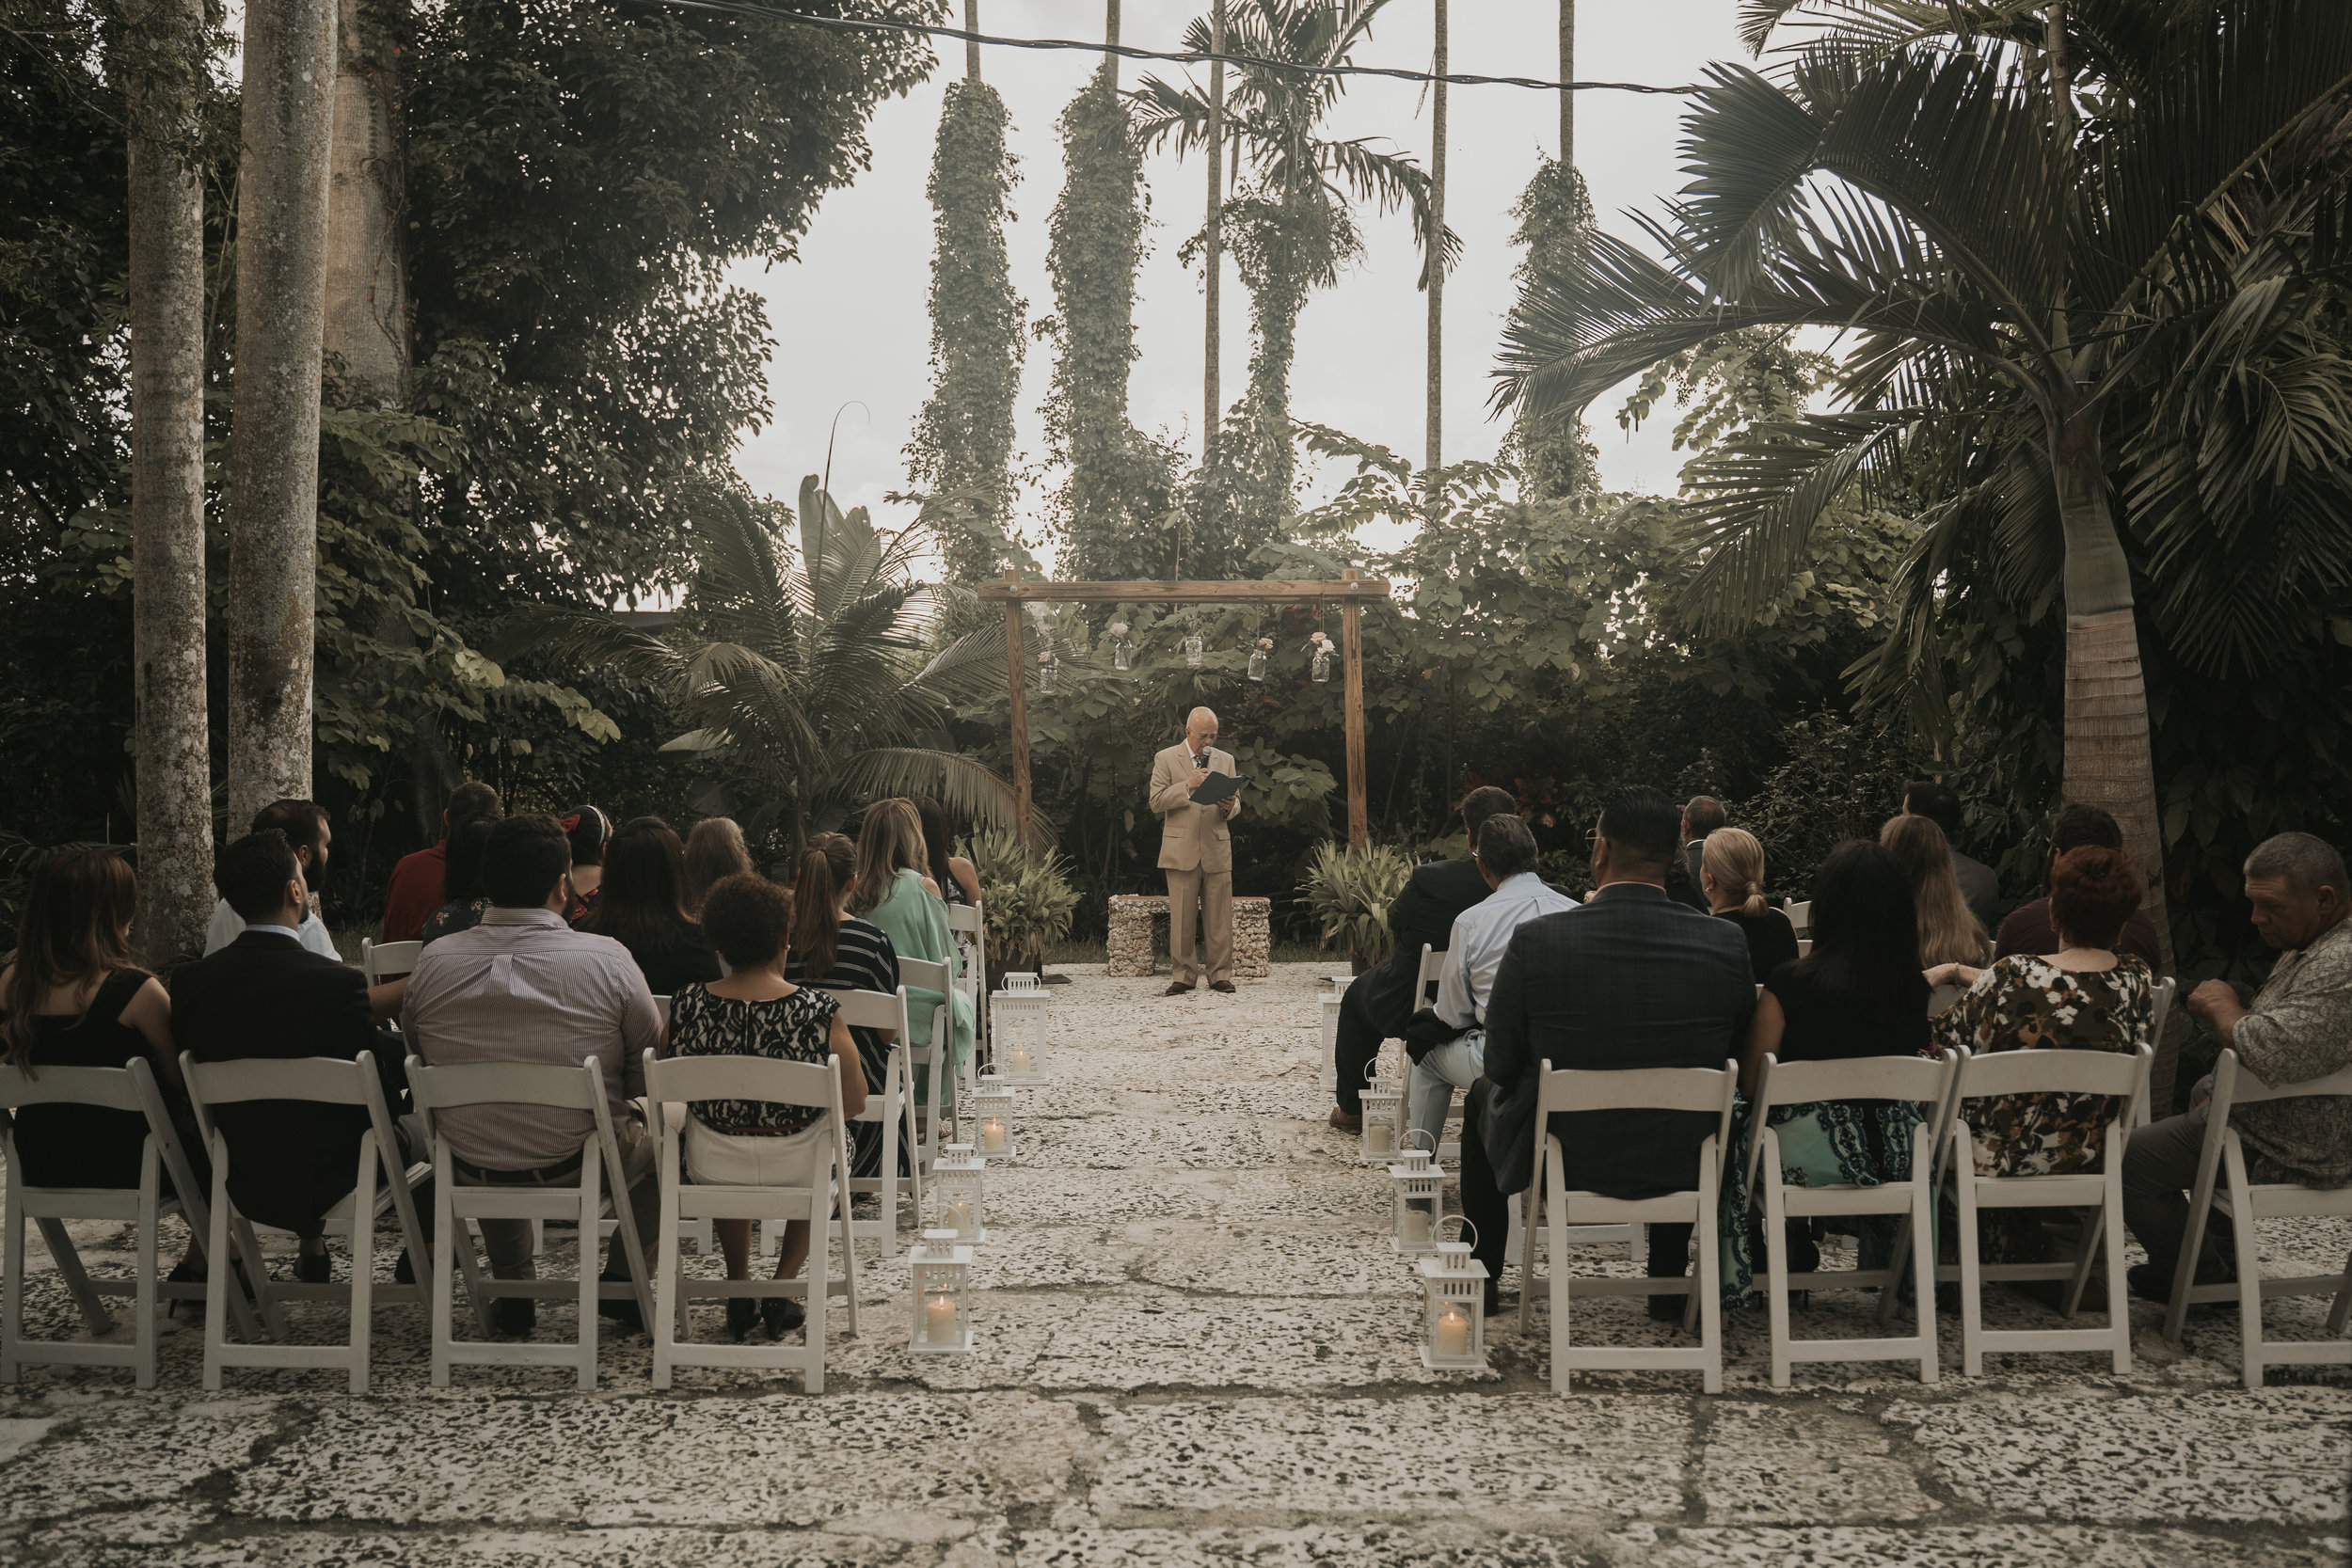 251MICHI&GABEWEDDINGDAY(WeddingFinal).jpg